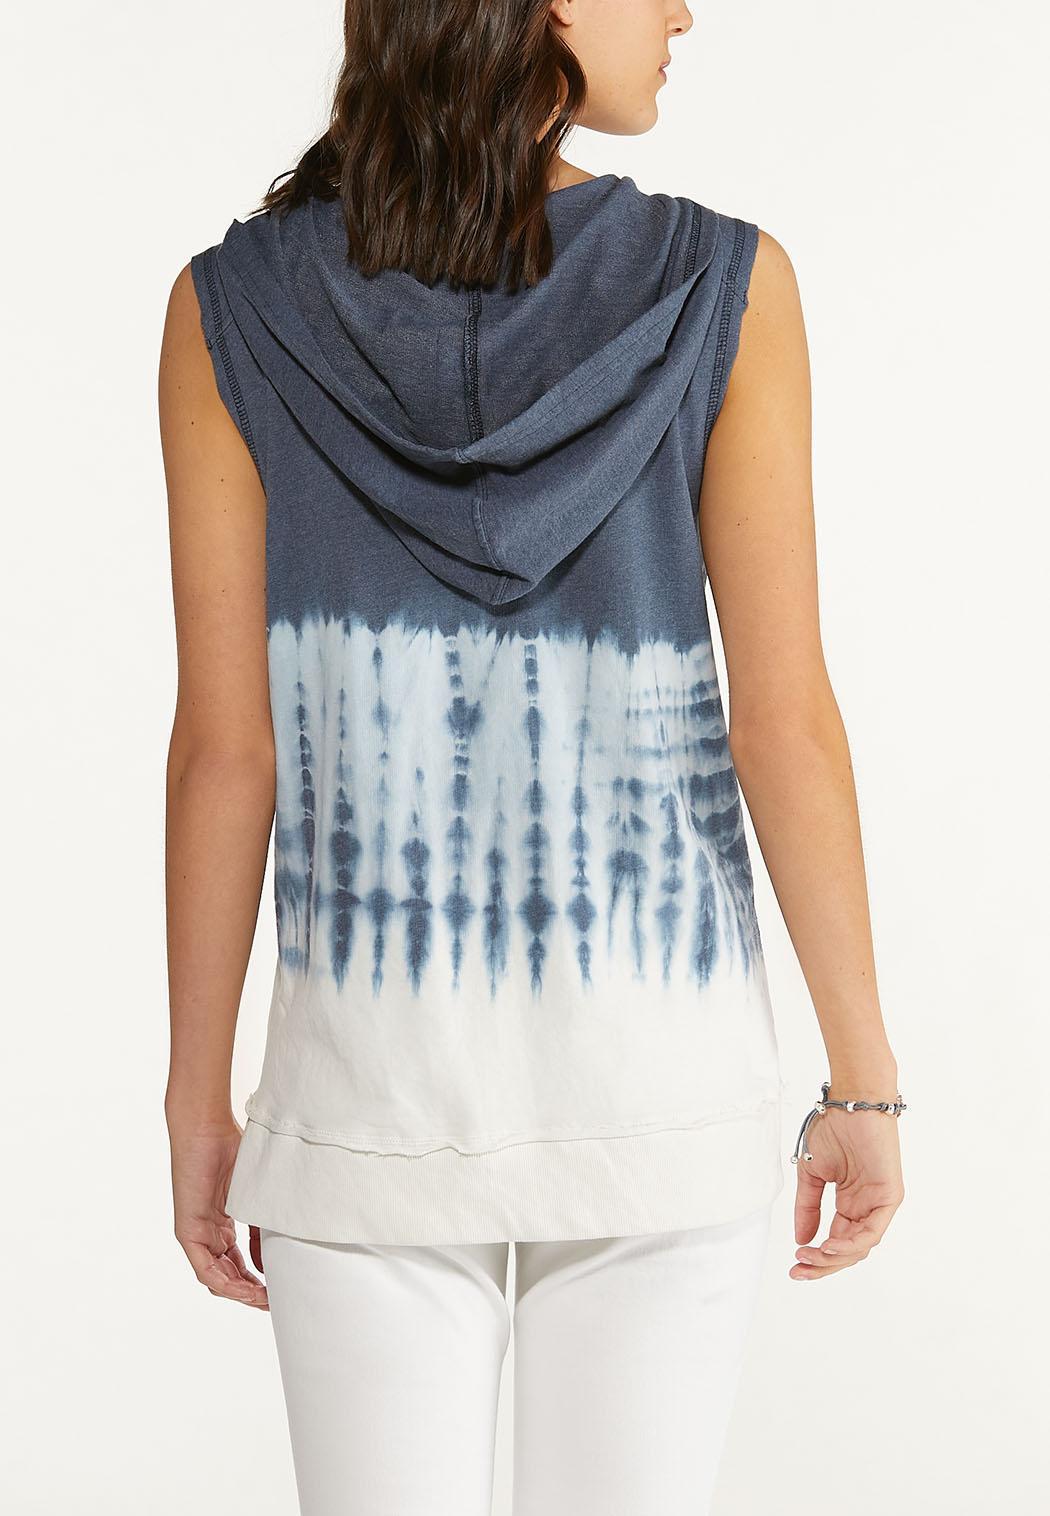 Hooded Tank Sweatshirt (Item #44633803)